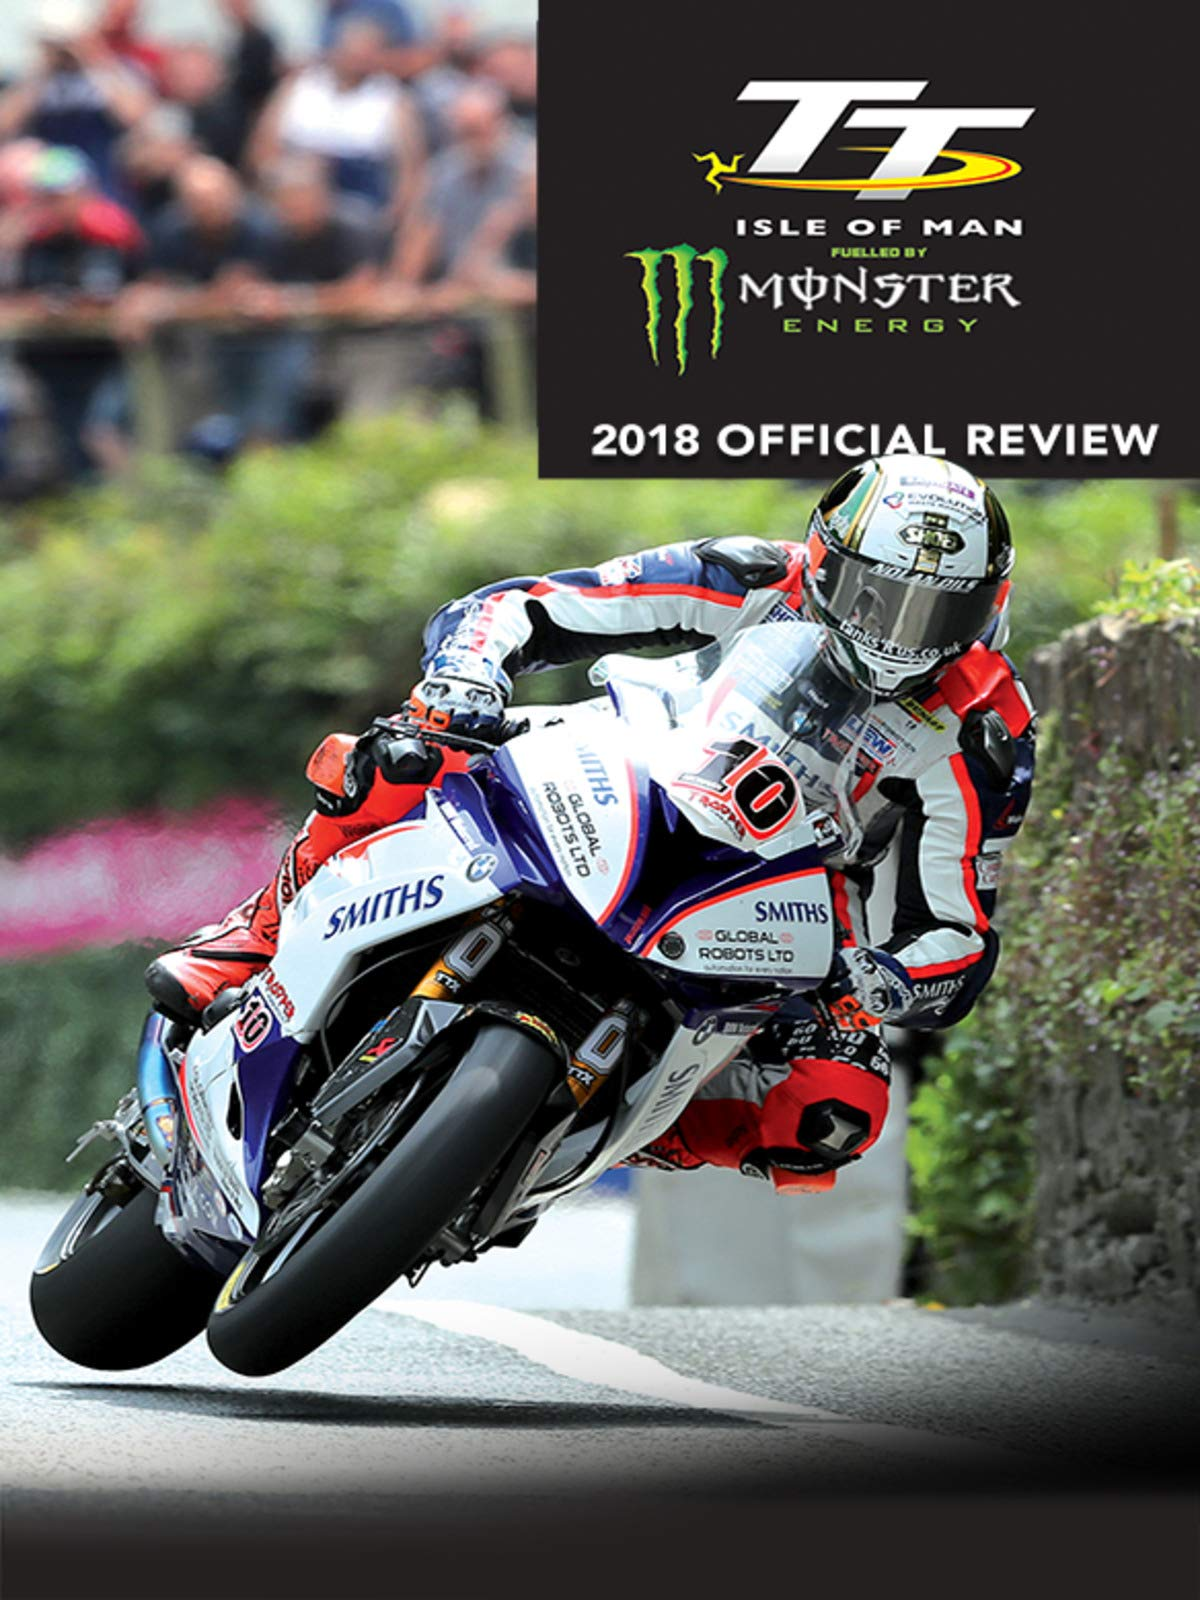 Isle of Man TT Review 2018